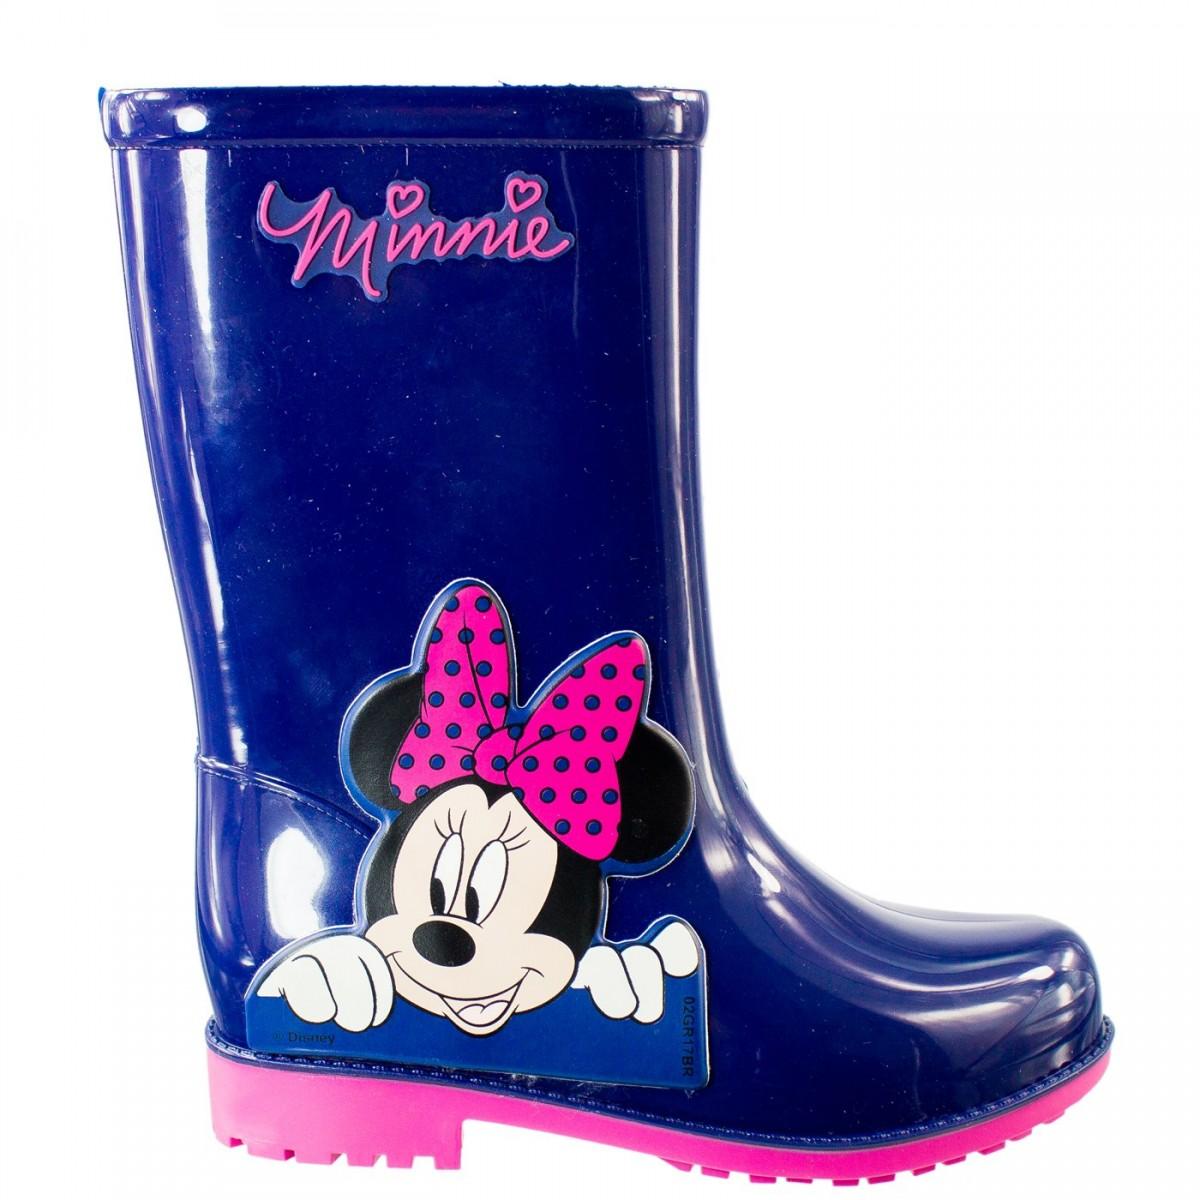 6a64a6e2ea3 Bizz Store - Galocha Infantil Menina Grendene Dreams Frozen